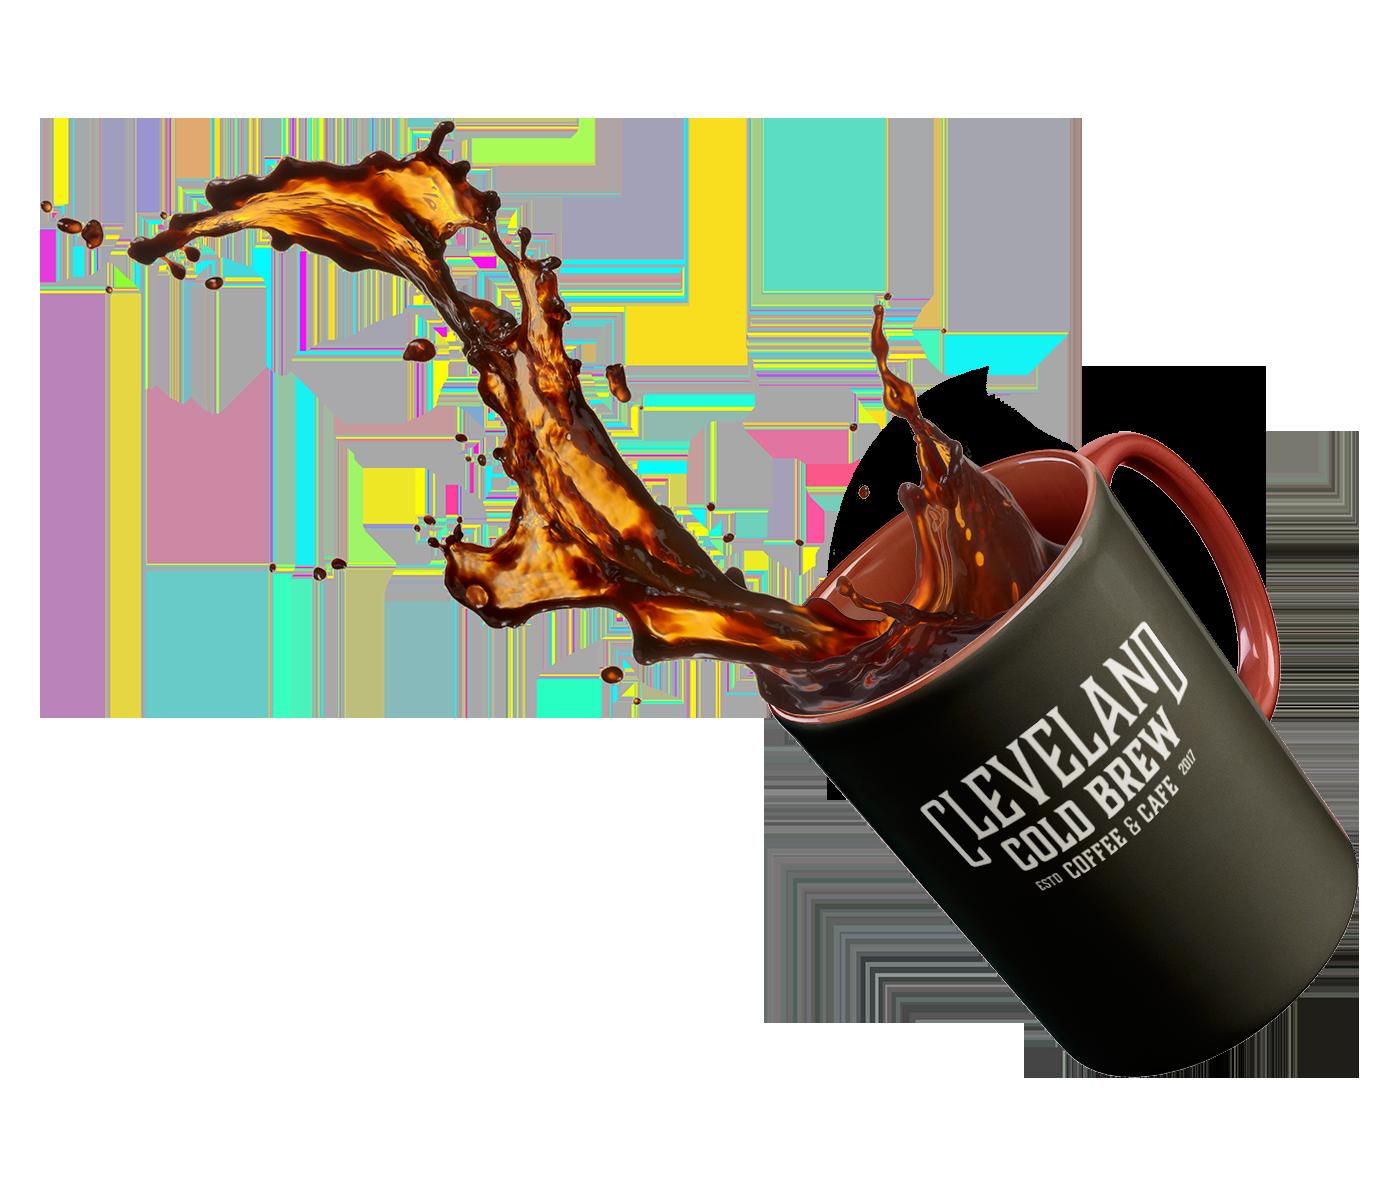 cle-cold-brew-mug-mockup